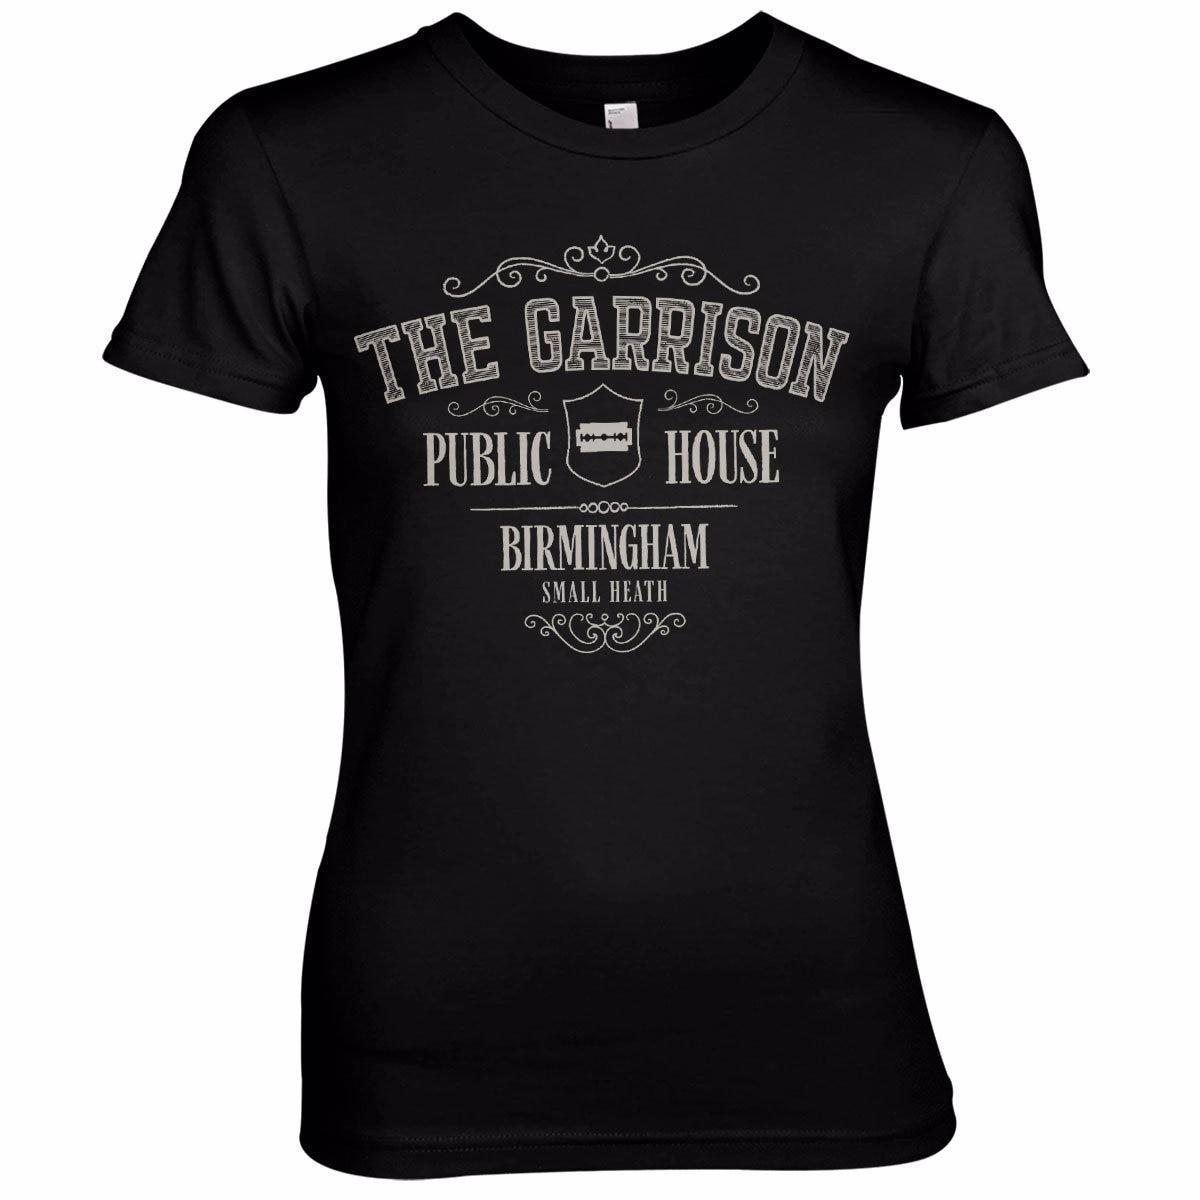 The Garrison Public House Girly Tee